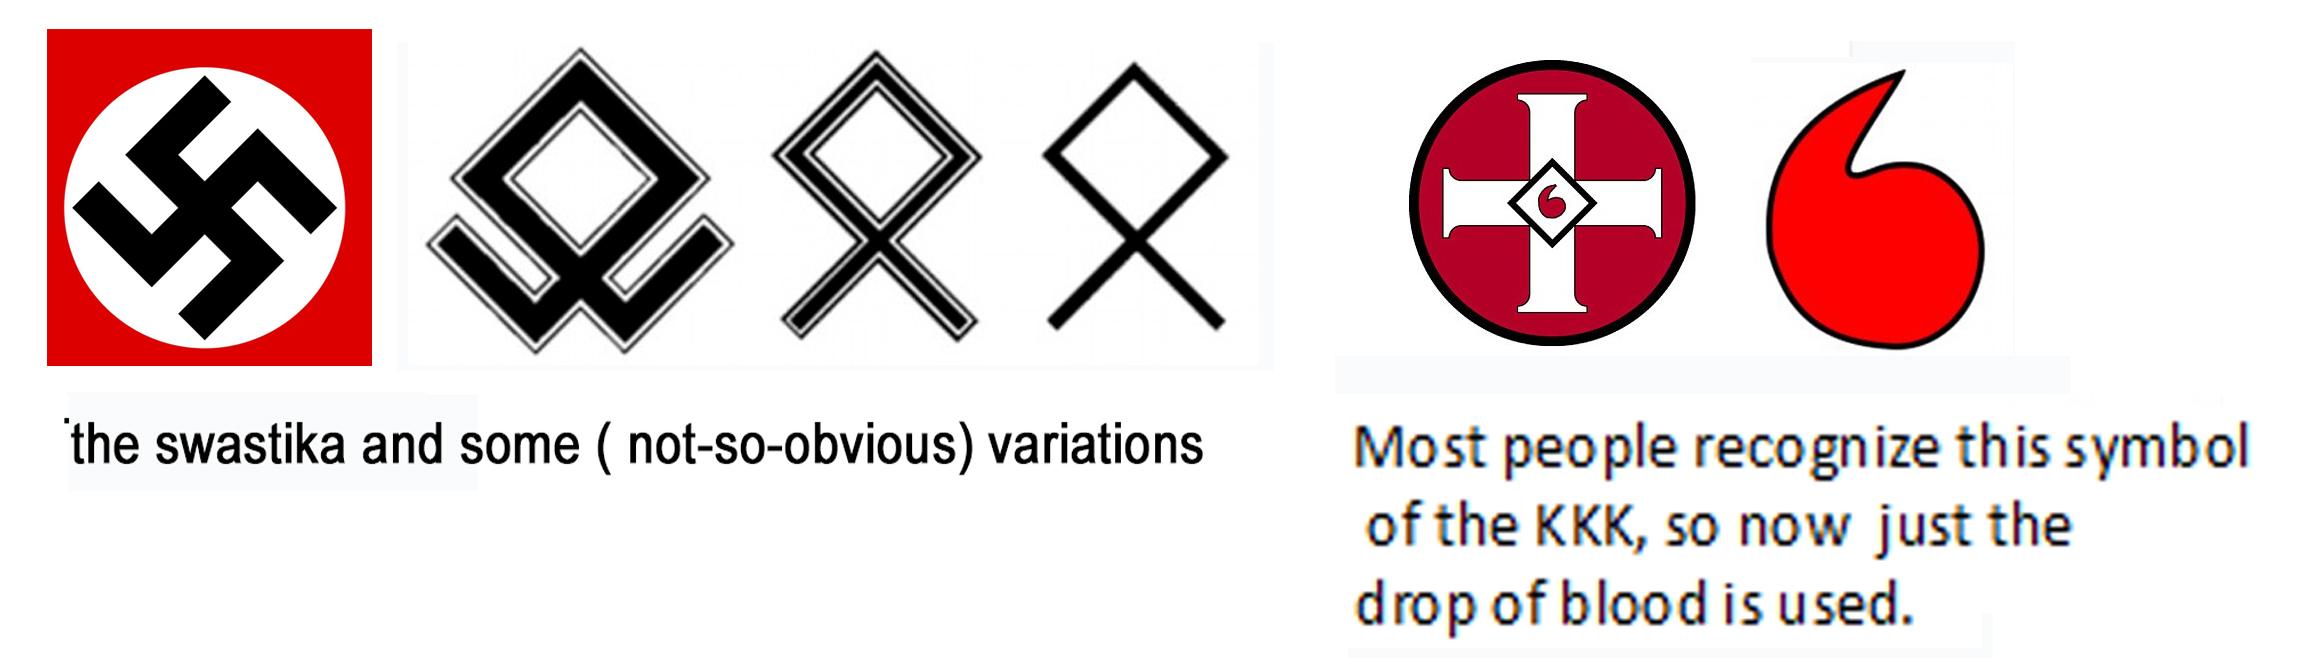 hate symbols blog 2.jpg